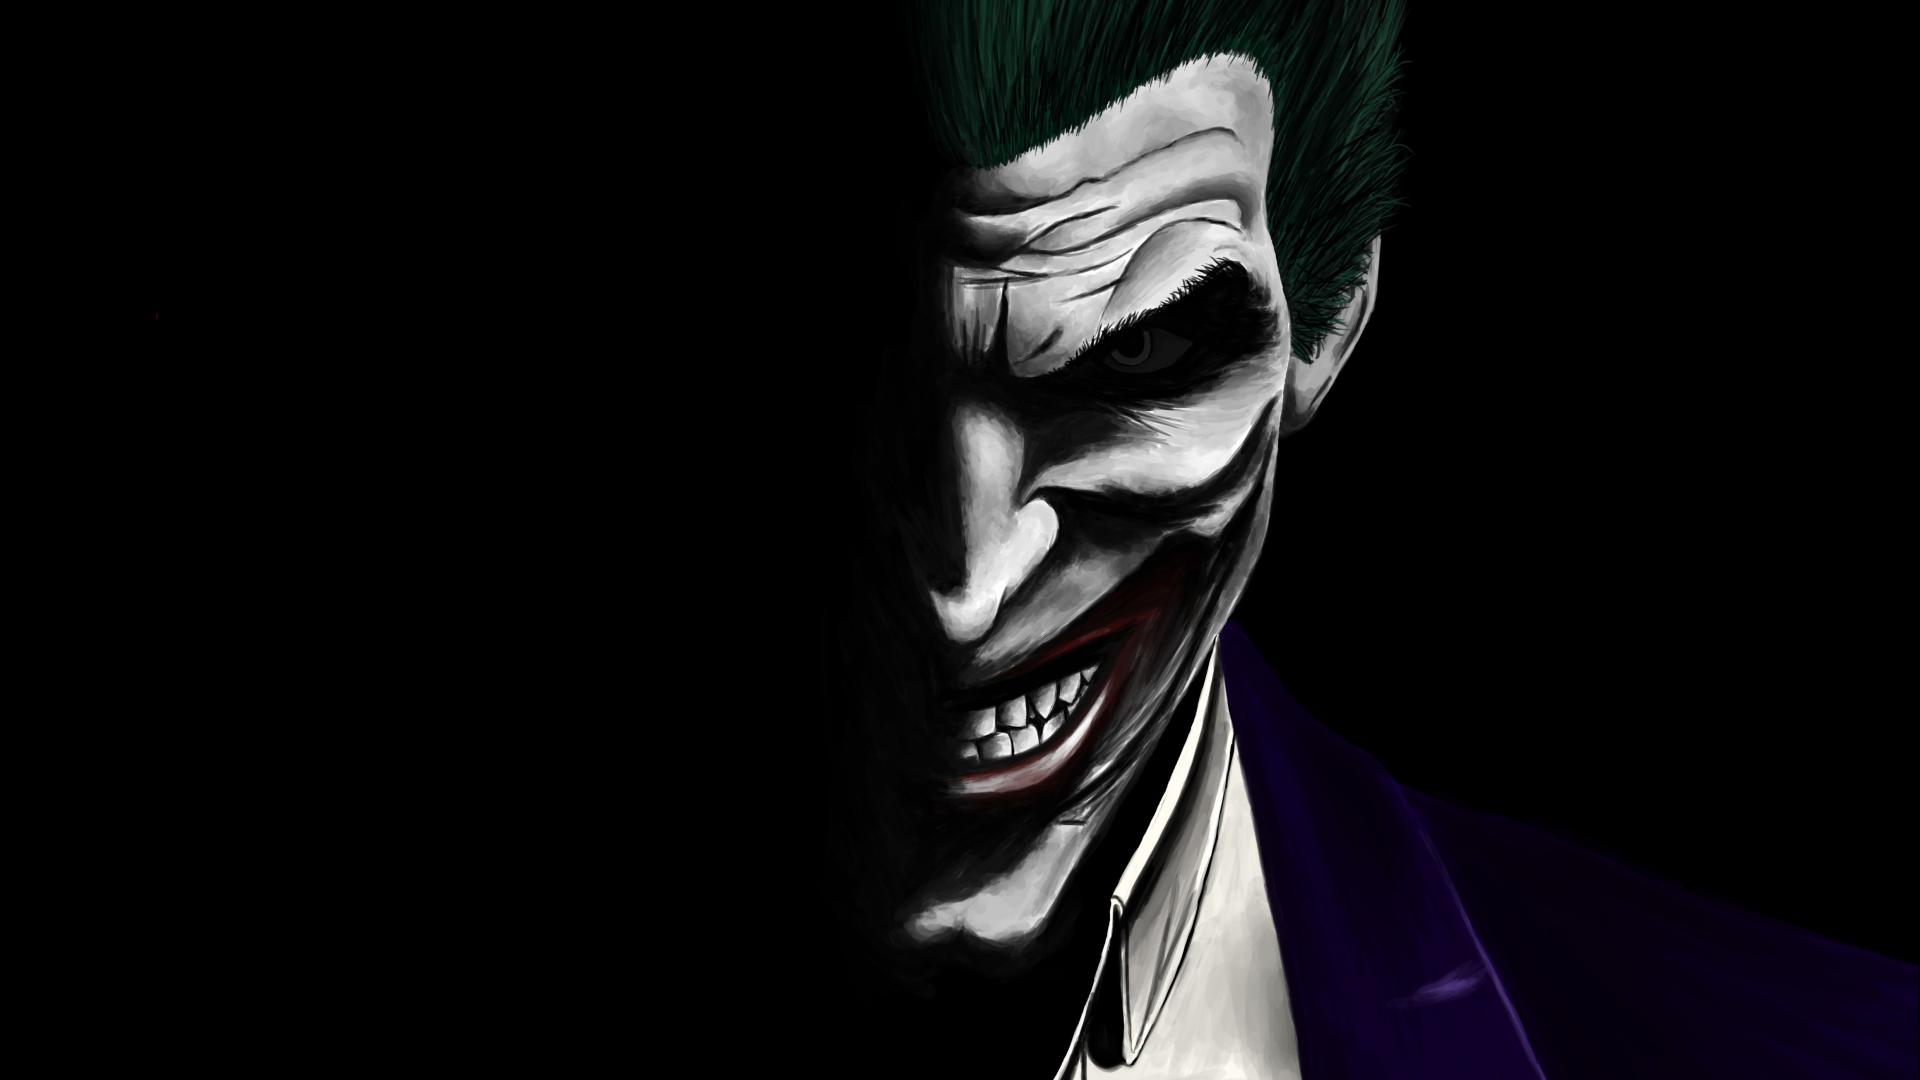 Download 1920x1080 wallpaper joker dark dc comics for Joker wallpaper 4k